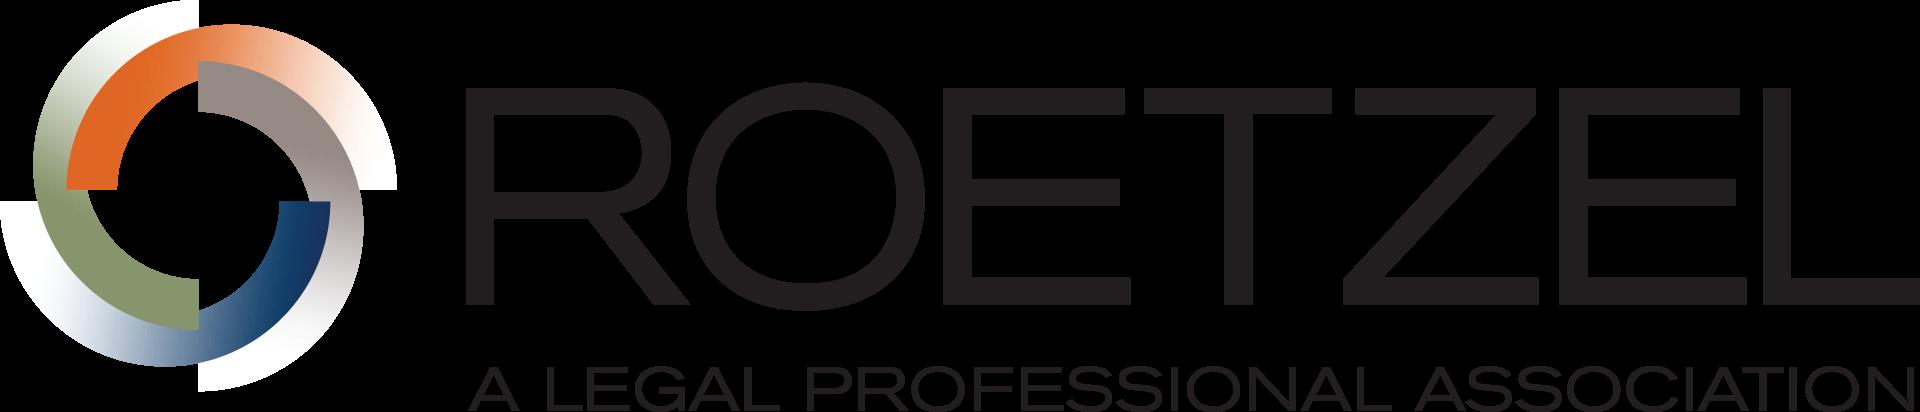 Roetzel_logo_LPA_Digital.png